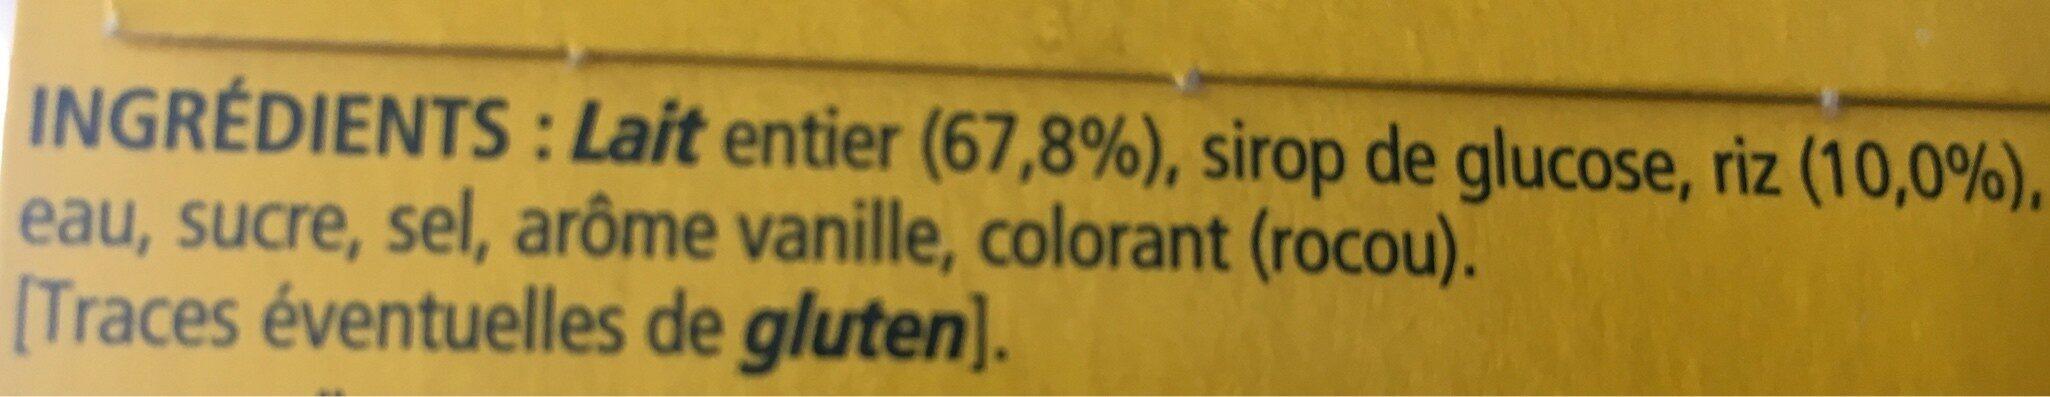 Riz au lait saveur vanille - Ingrediënten